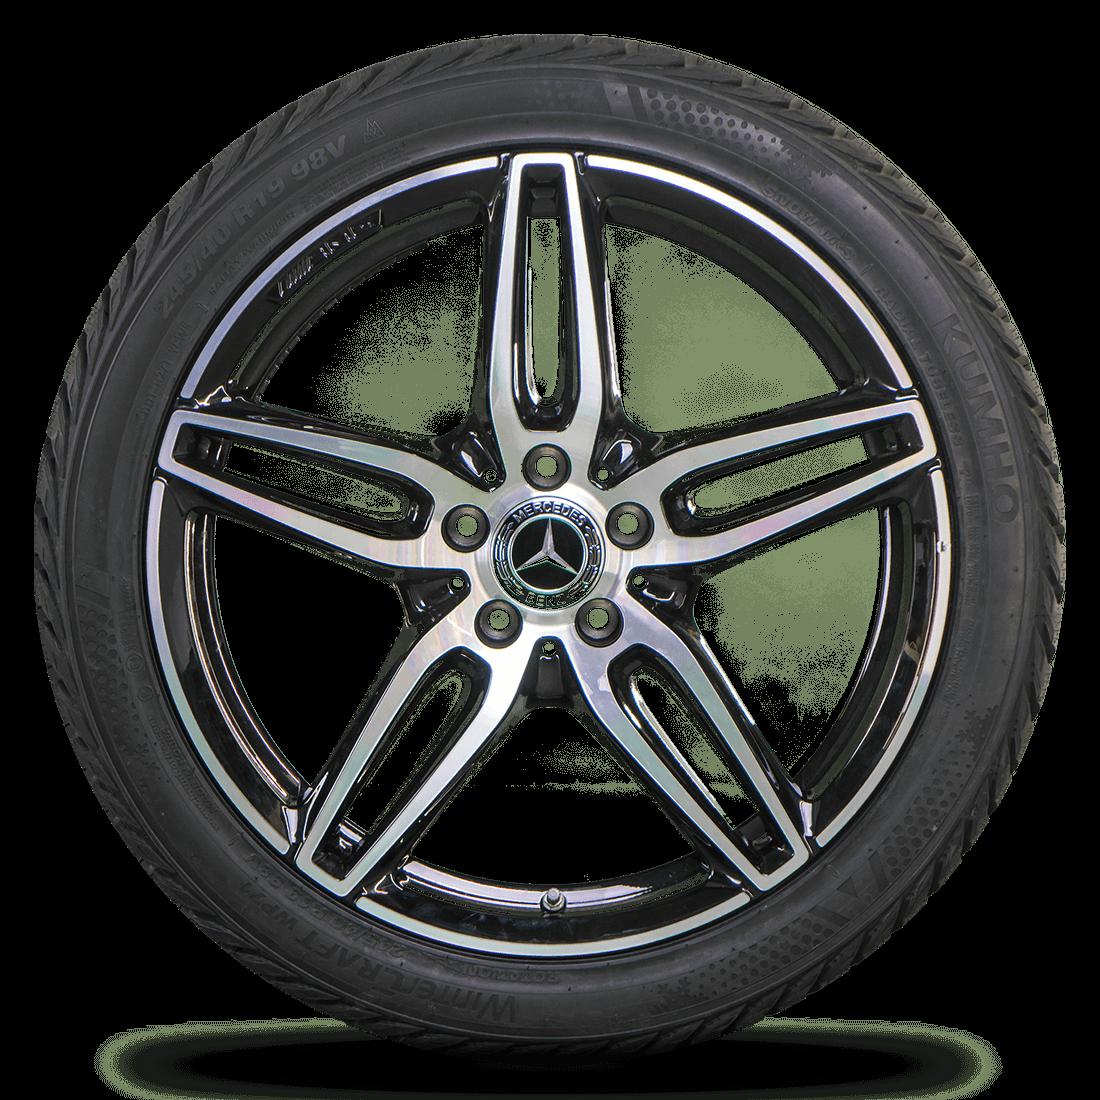 AMG 19 inch rims Mercedes E-class E43 W213 S213 winter tires winter wheels